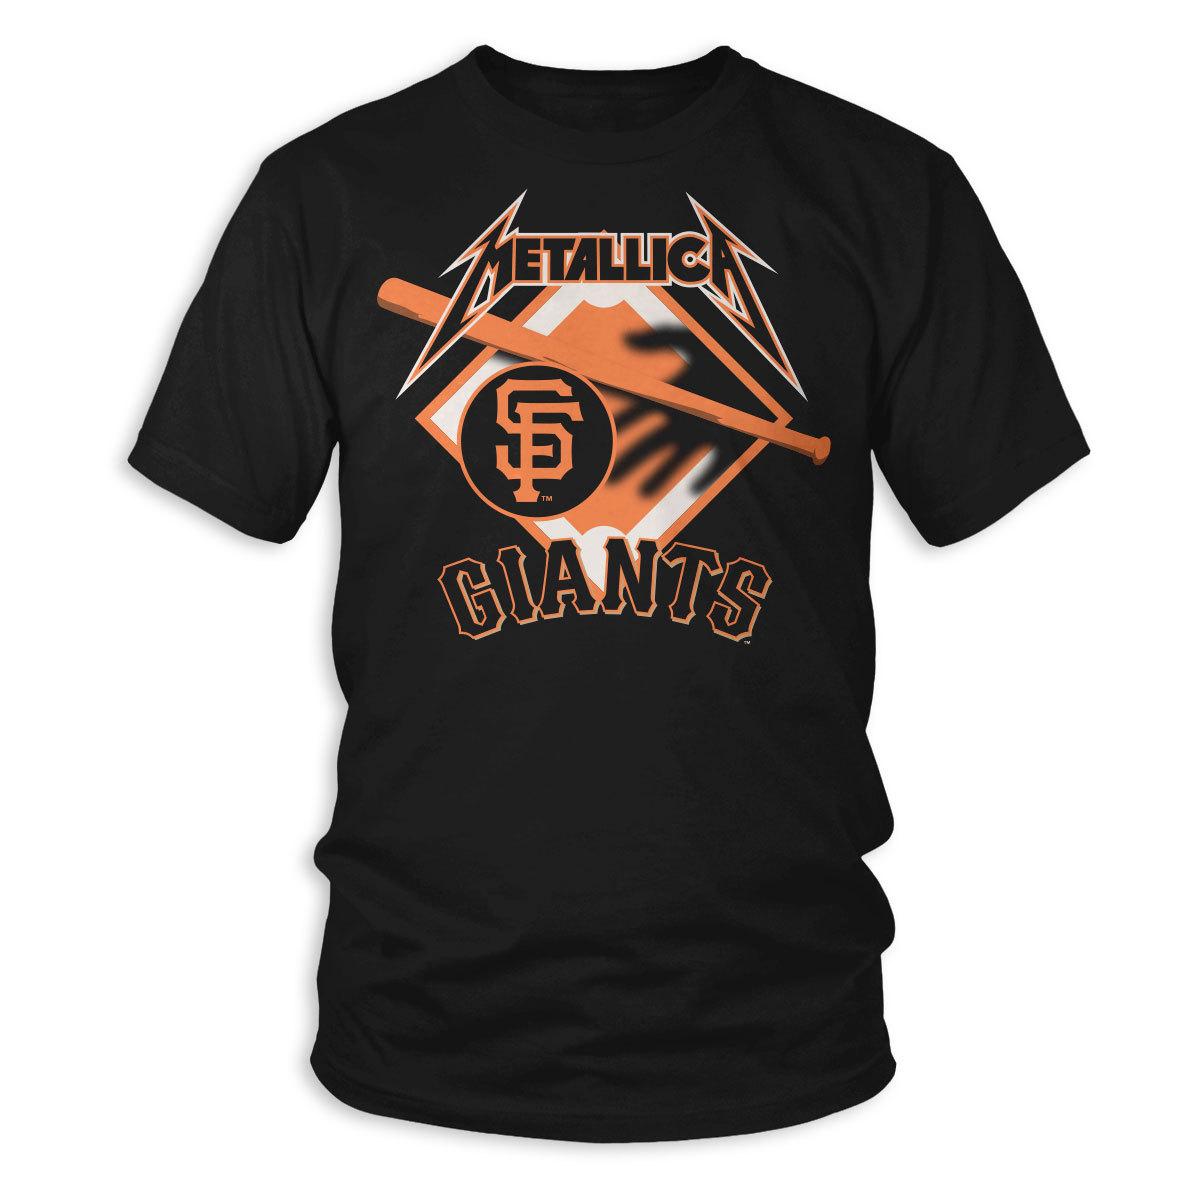 low priced ff141 aef0a SF Giants Hit 'Em All T-Shirt | Metallica.com